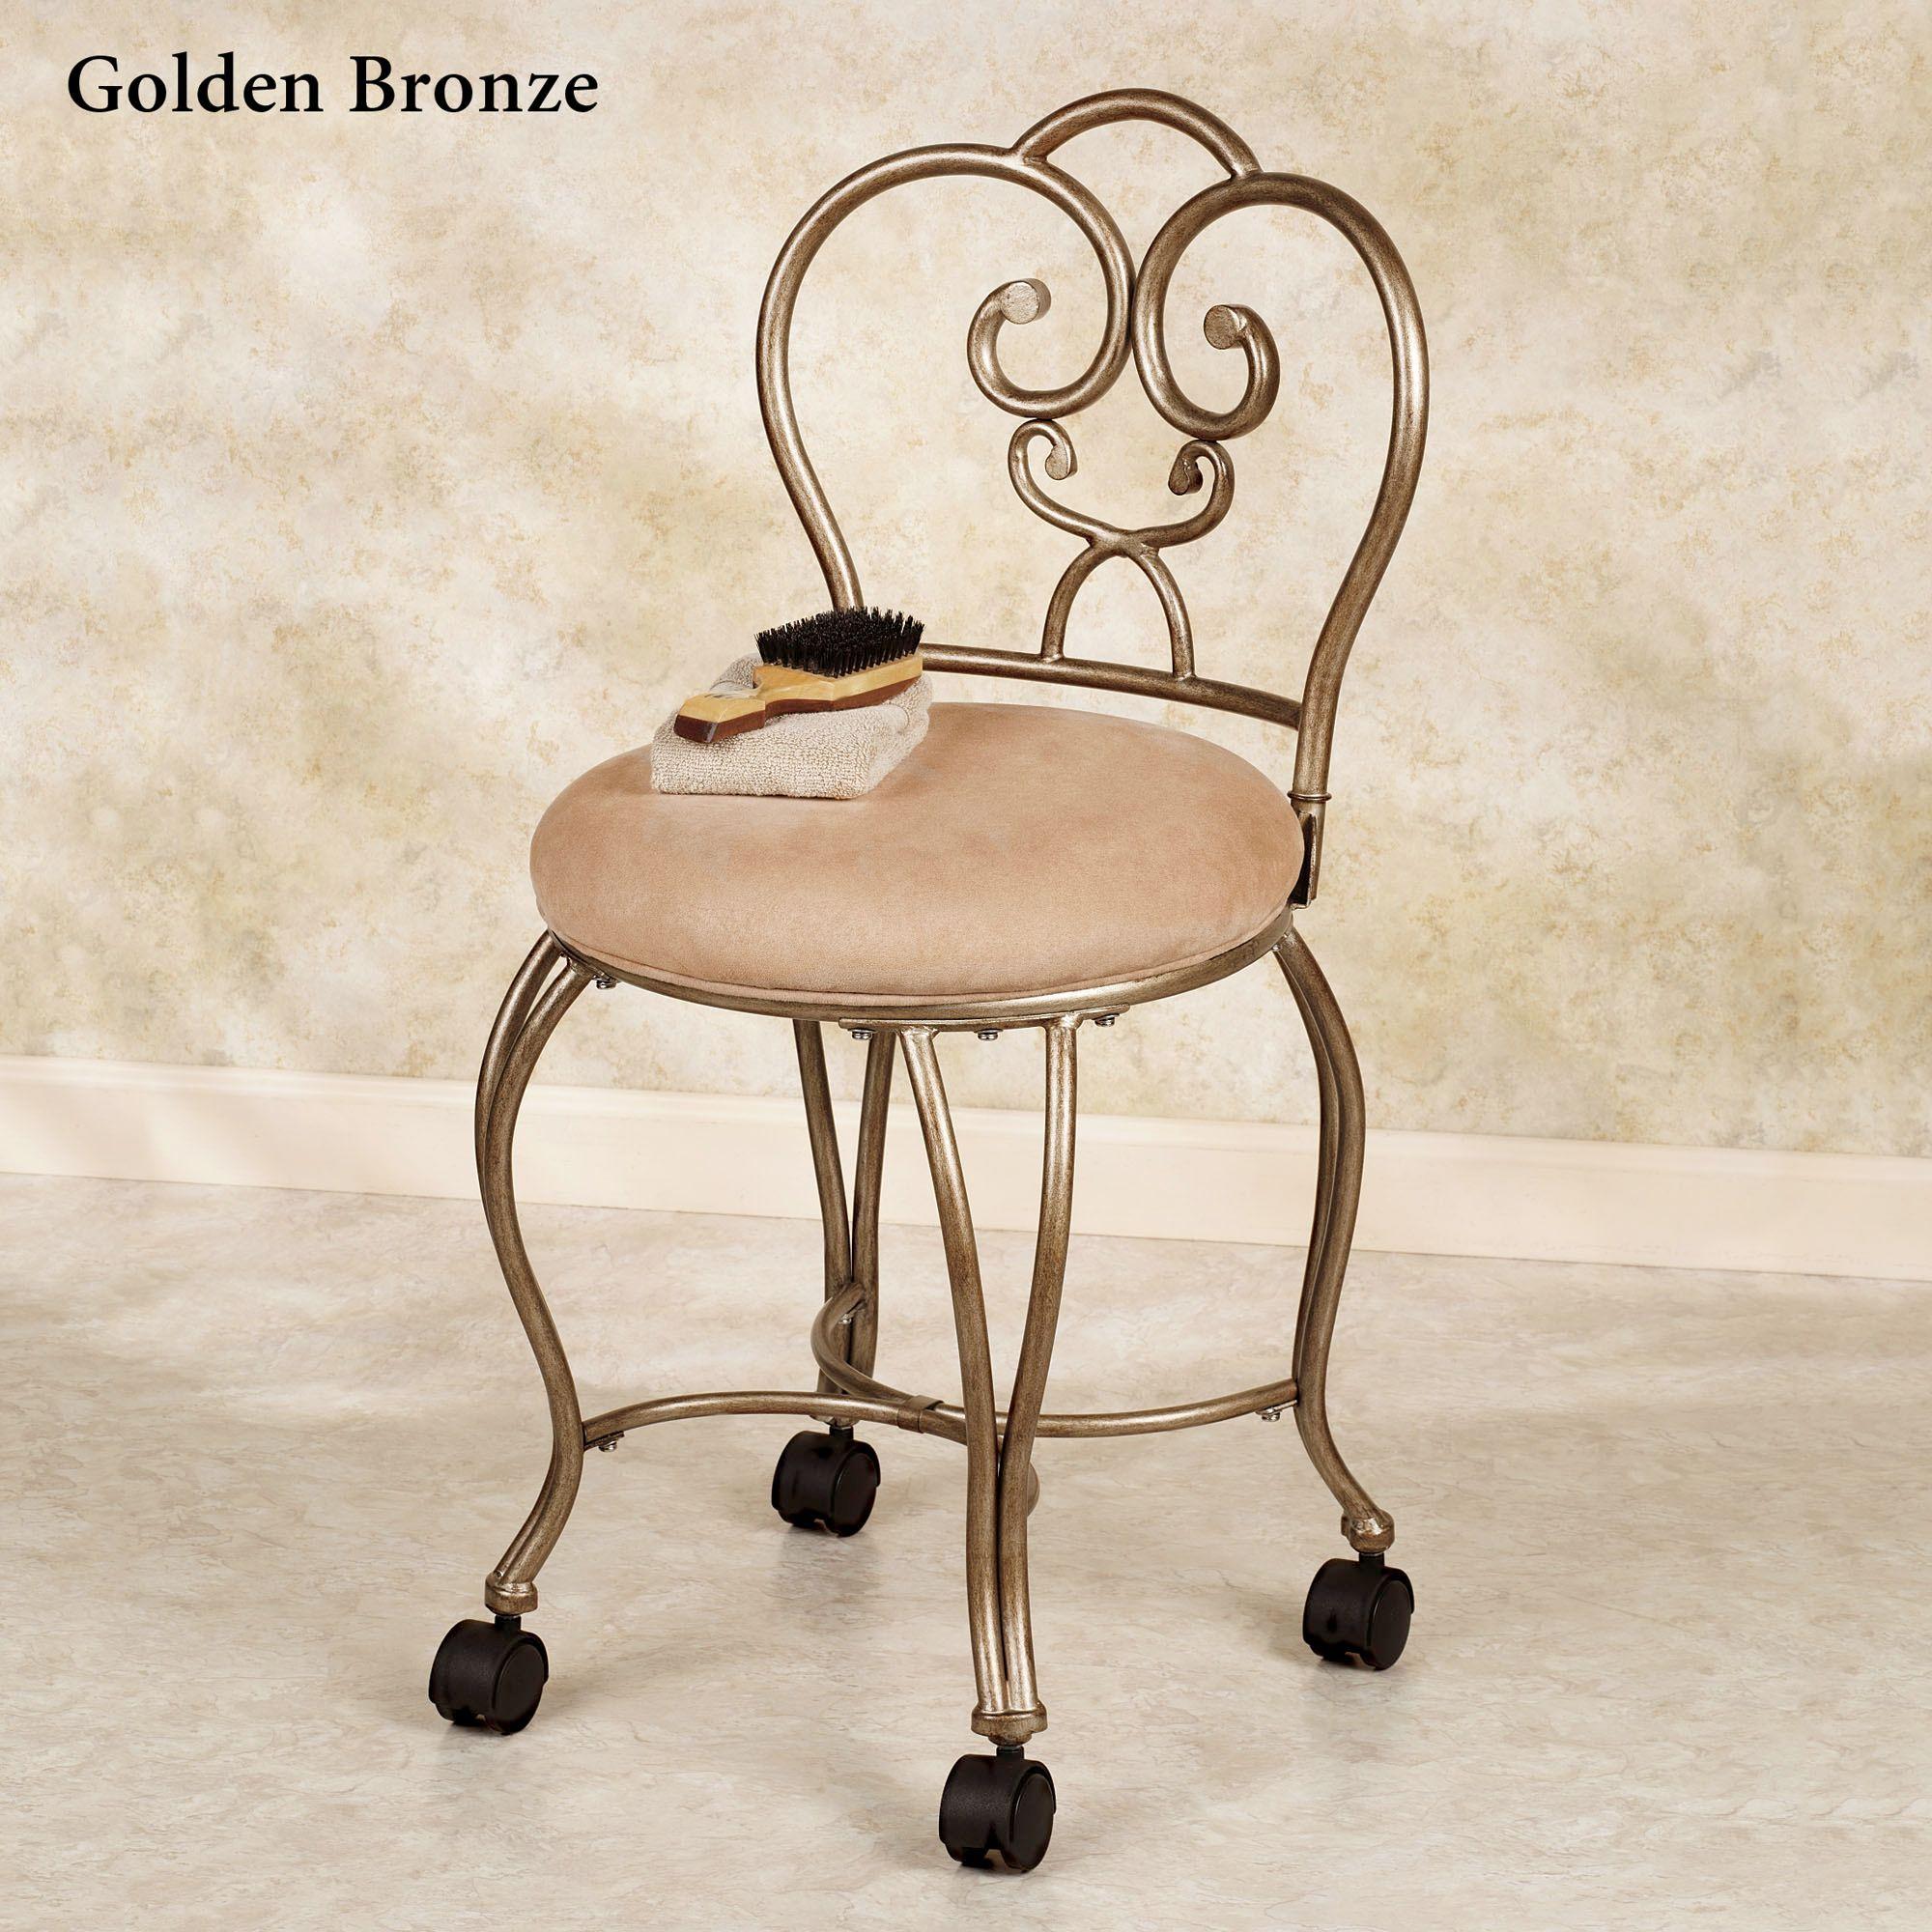 Lecia vanity chair vanity chair chair shabby chic